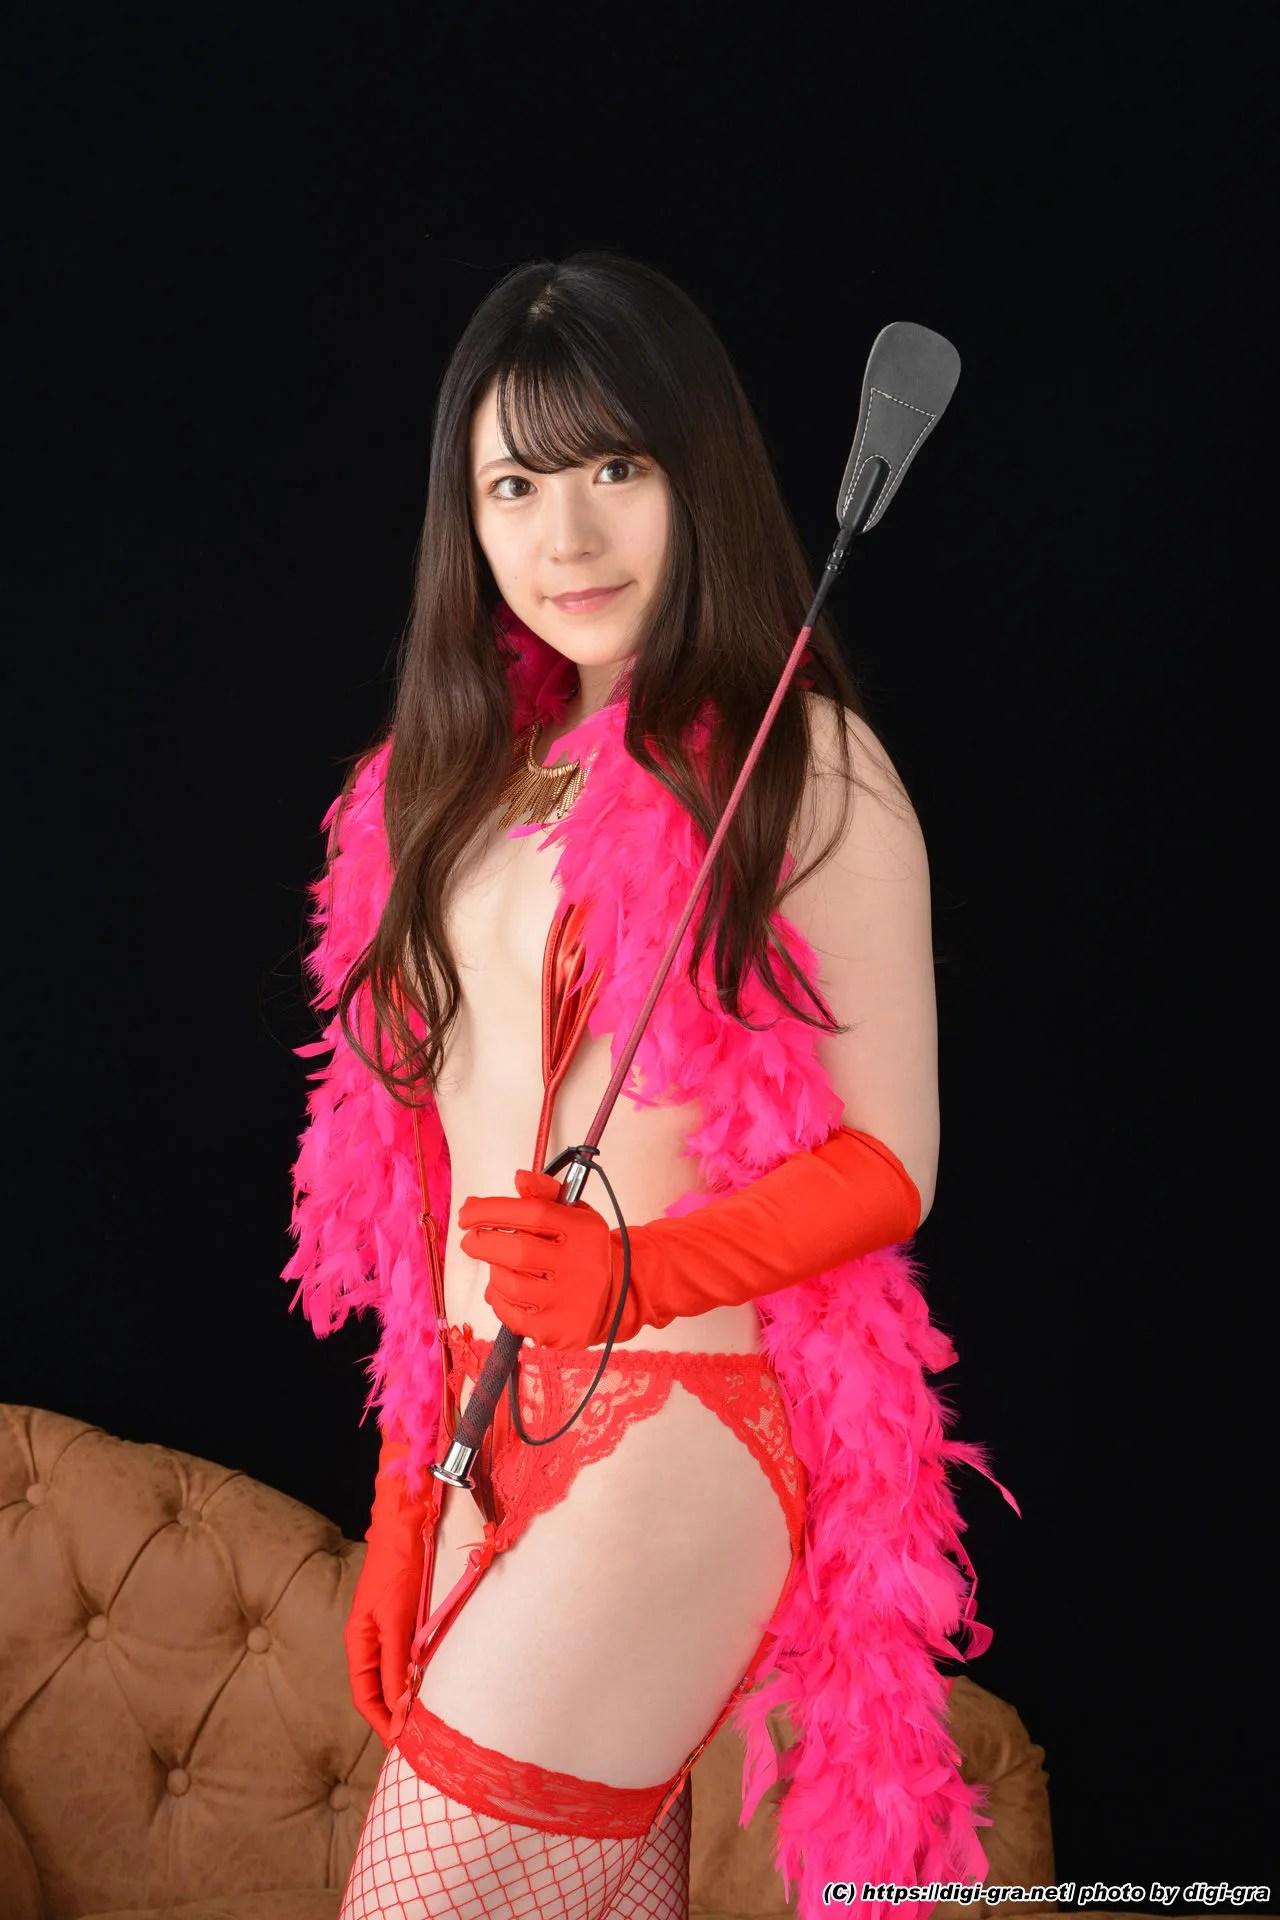 [Digi-Gra] Nanami Oozora 大空七海 Photoset 04 写真套图[70P]插图(4)